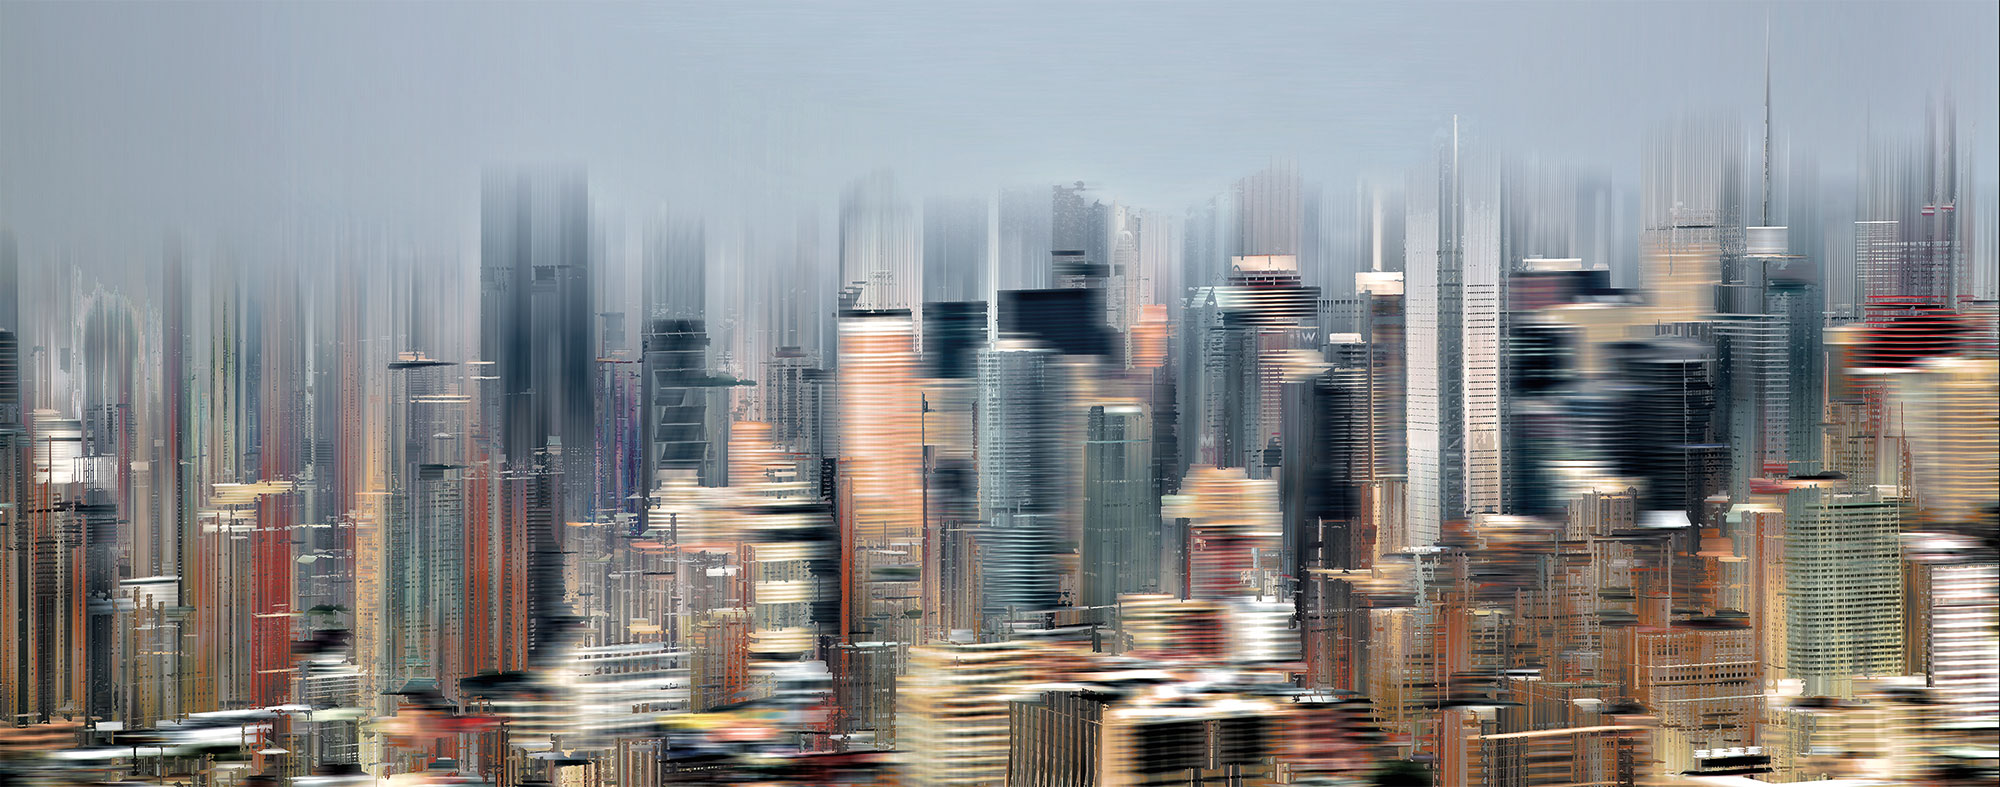 Sabine Wild: Bild 'New York I' (2007)